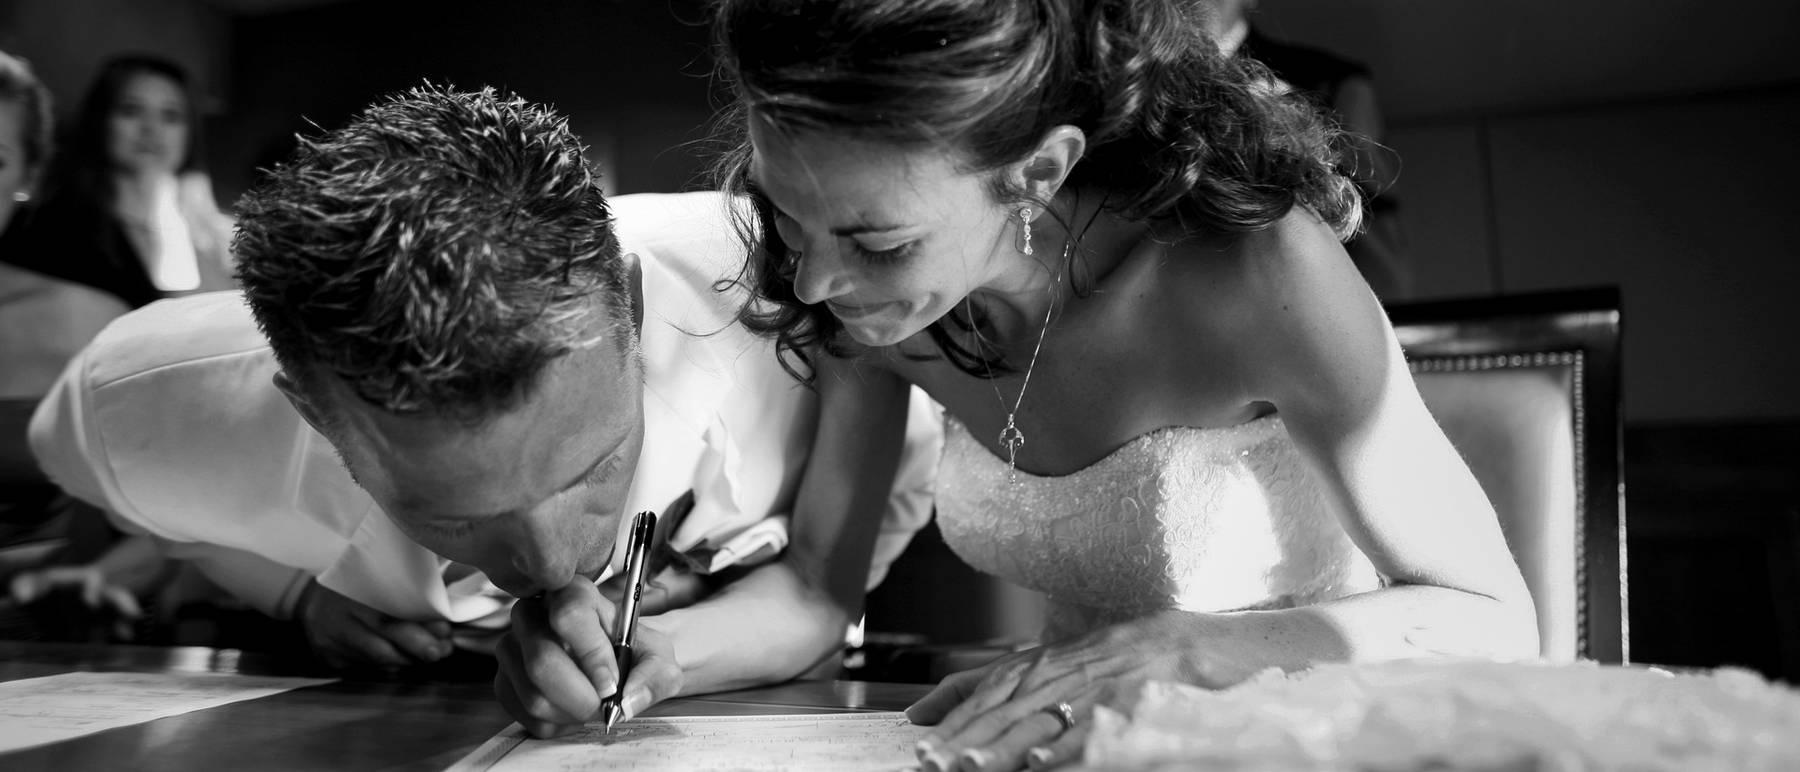 johnandjoseph-wedding-photographer-hz-slider-374